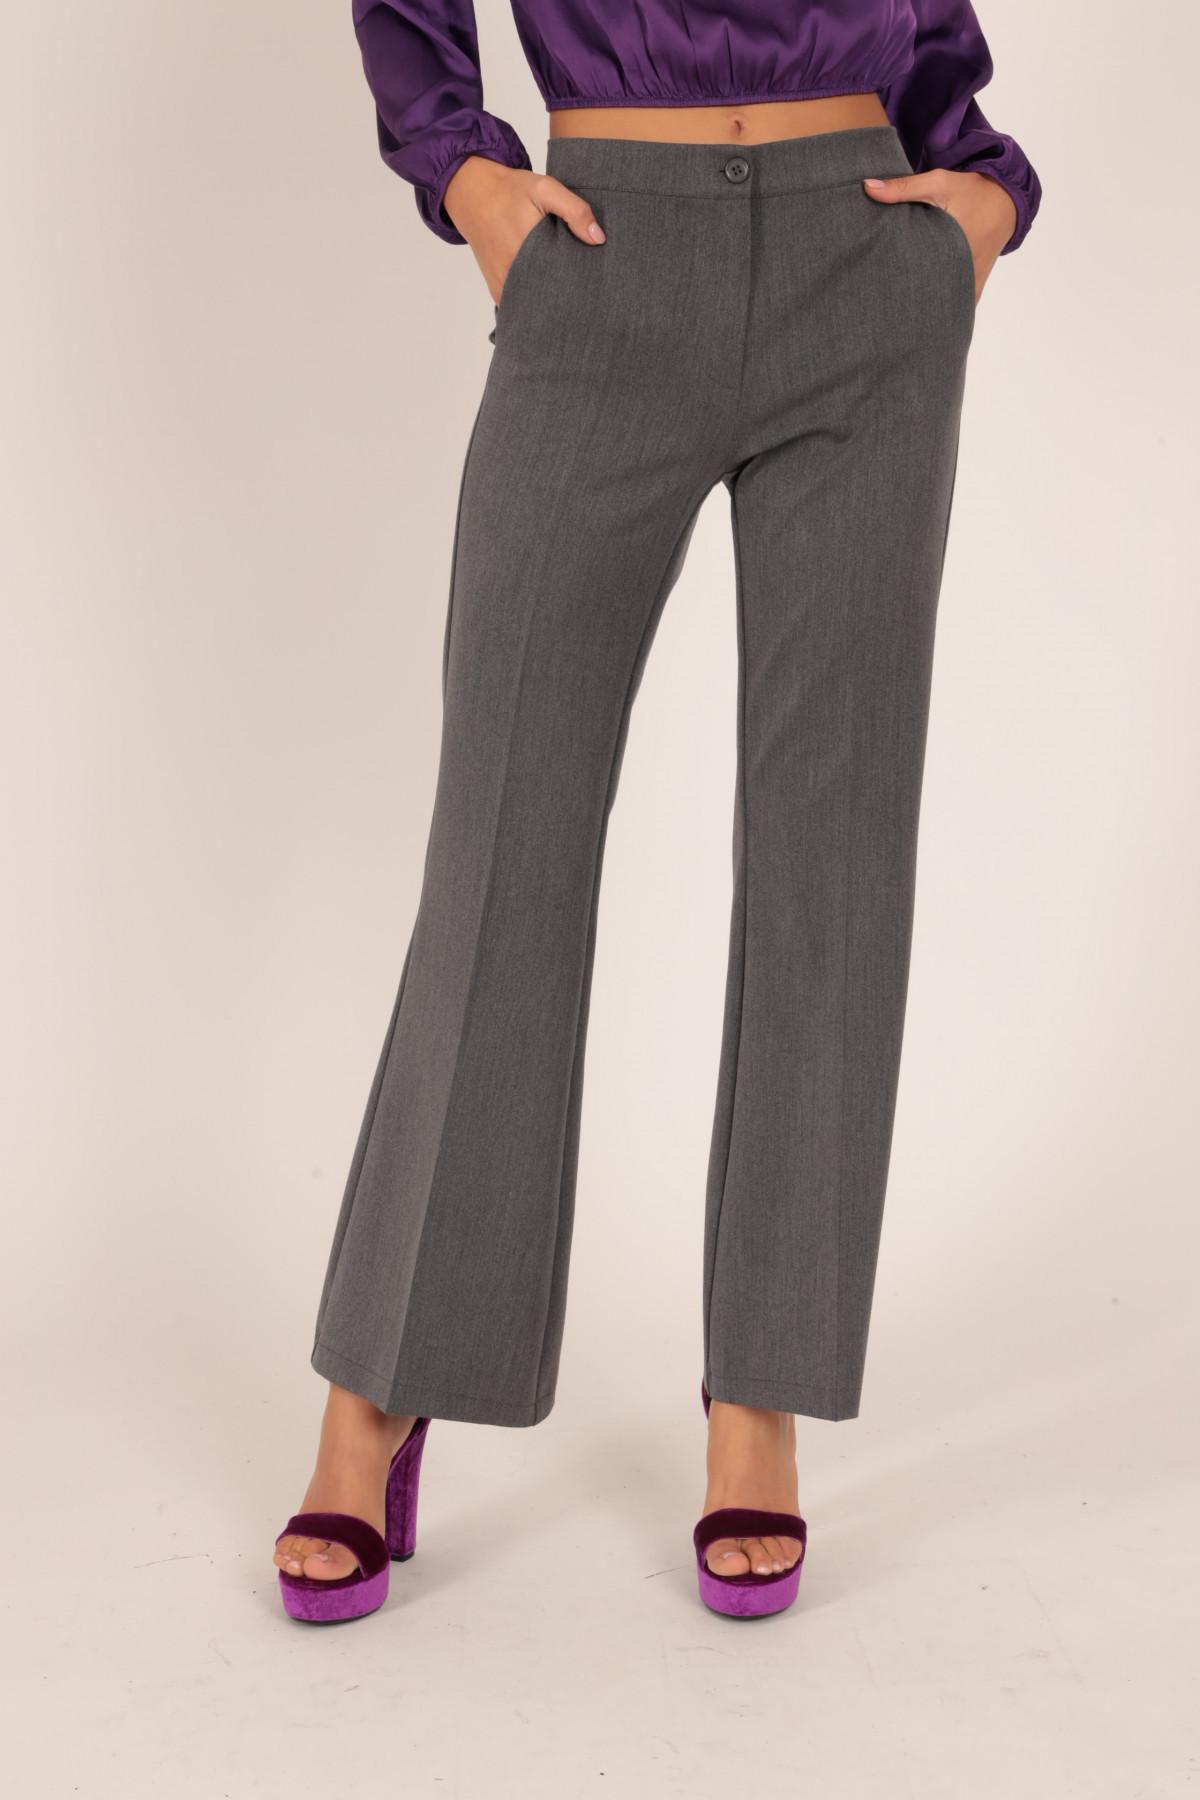 Pantalone 79%pl 17%vi 4%ea